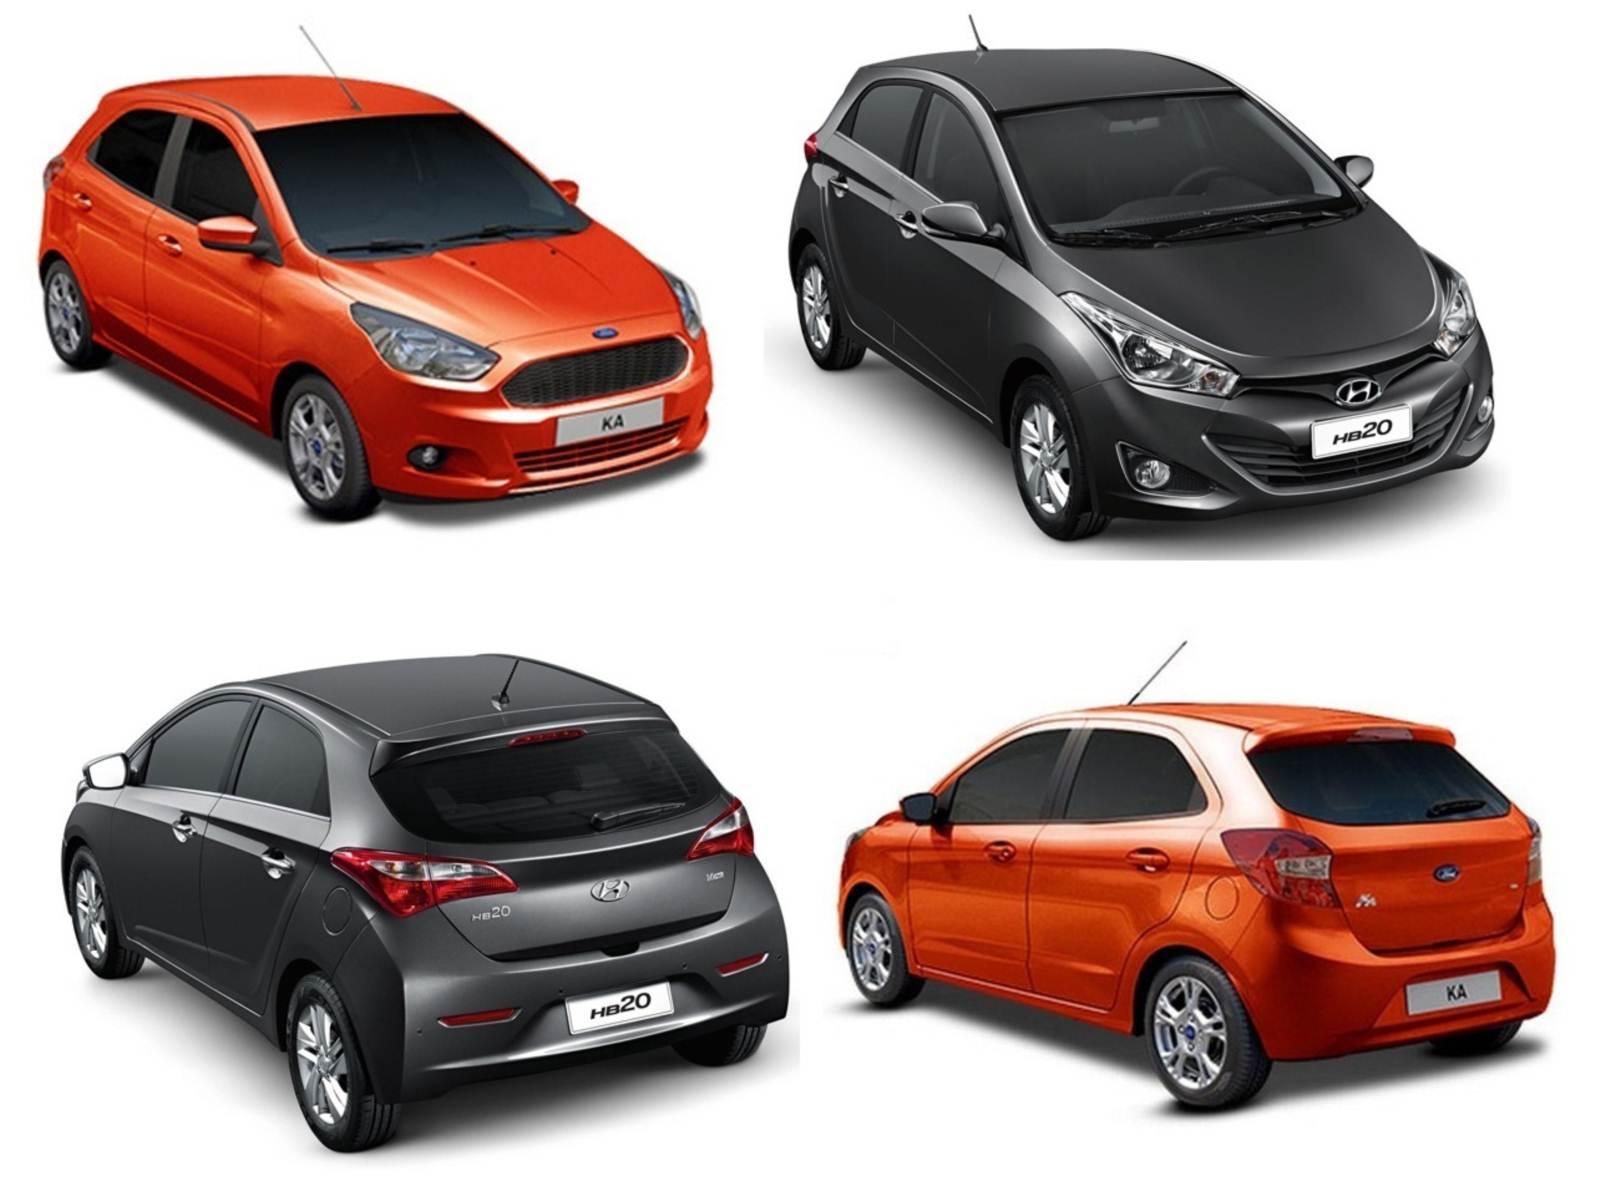 Novo Ford Ka X Hyundai Hb Comparativo